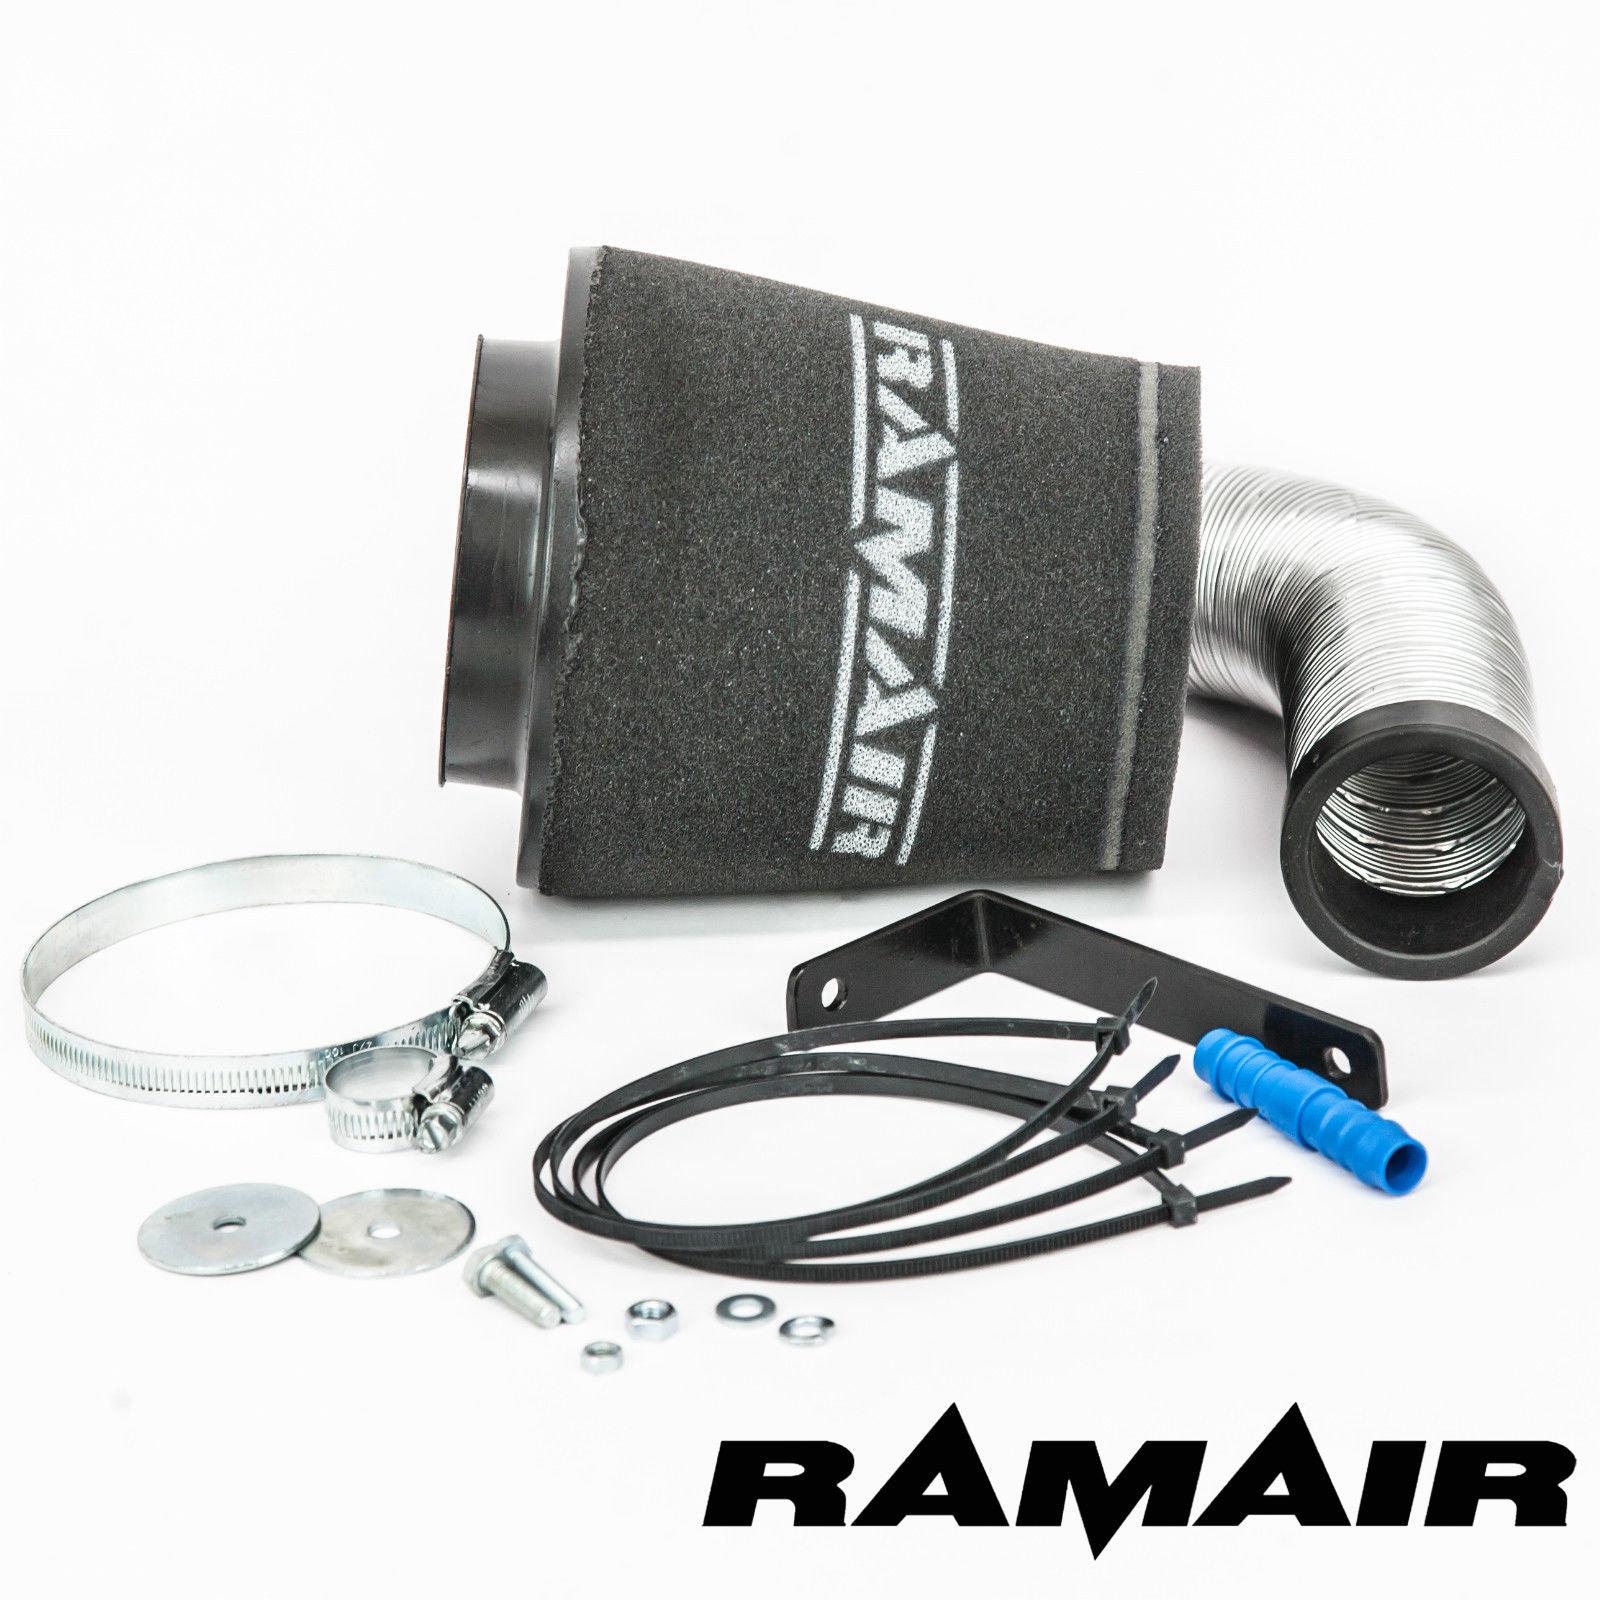 Ford Puma 1 7 Camshafts: Ford Puma 1.7i 16v RAMAIR Induction Intake Air Filter Kit